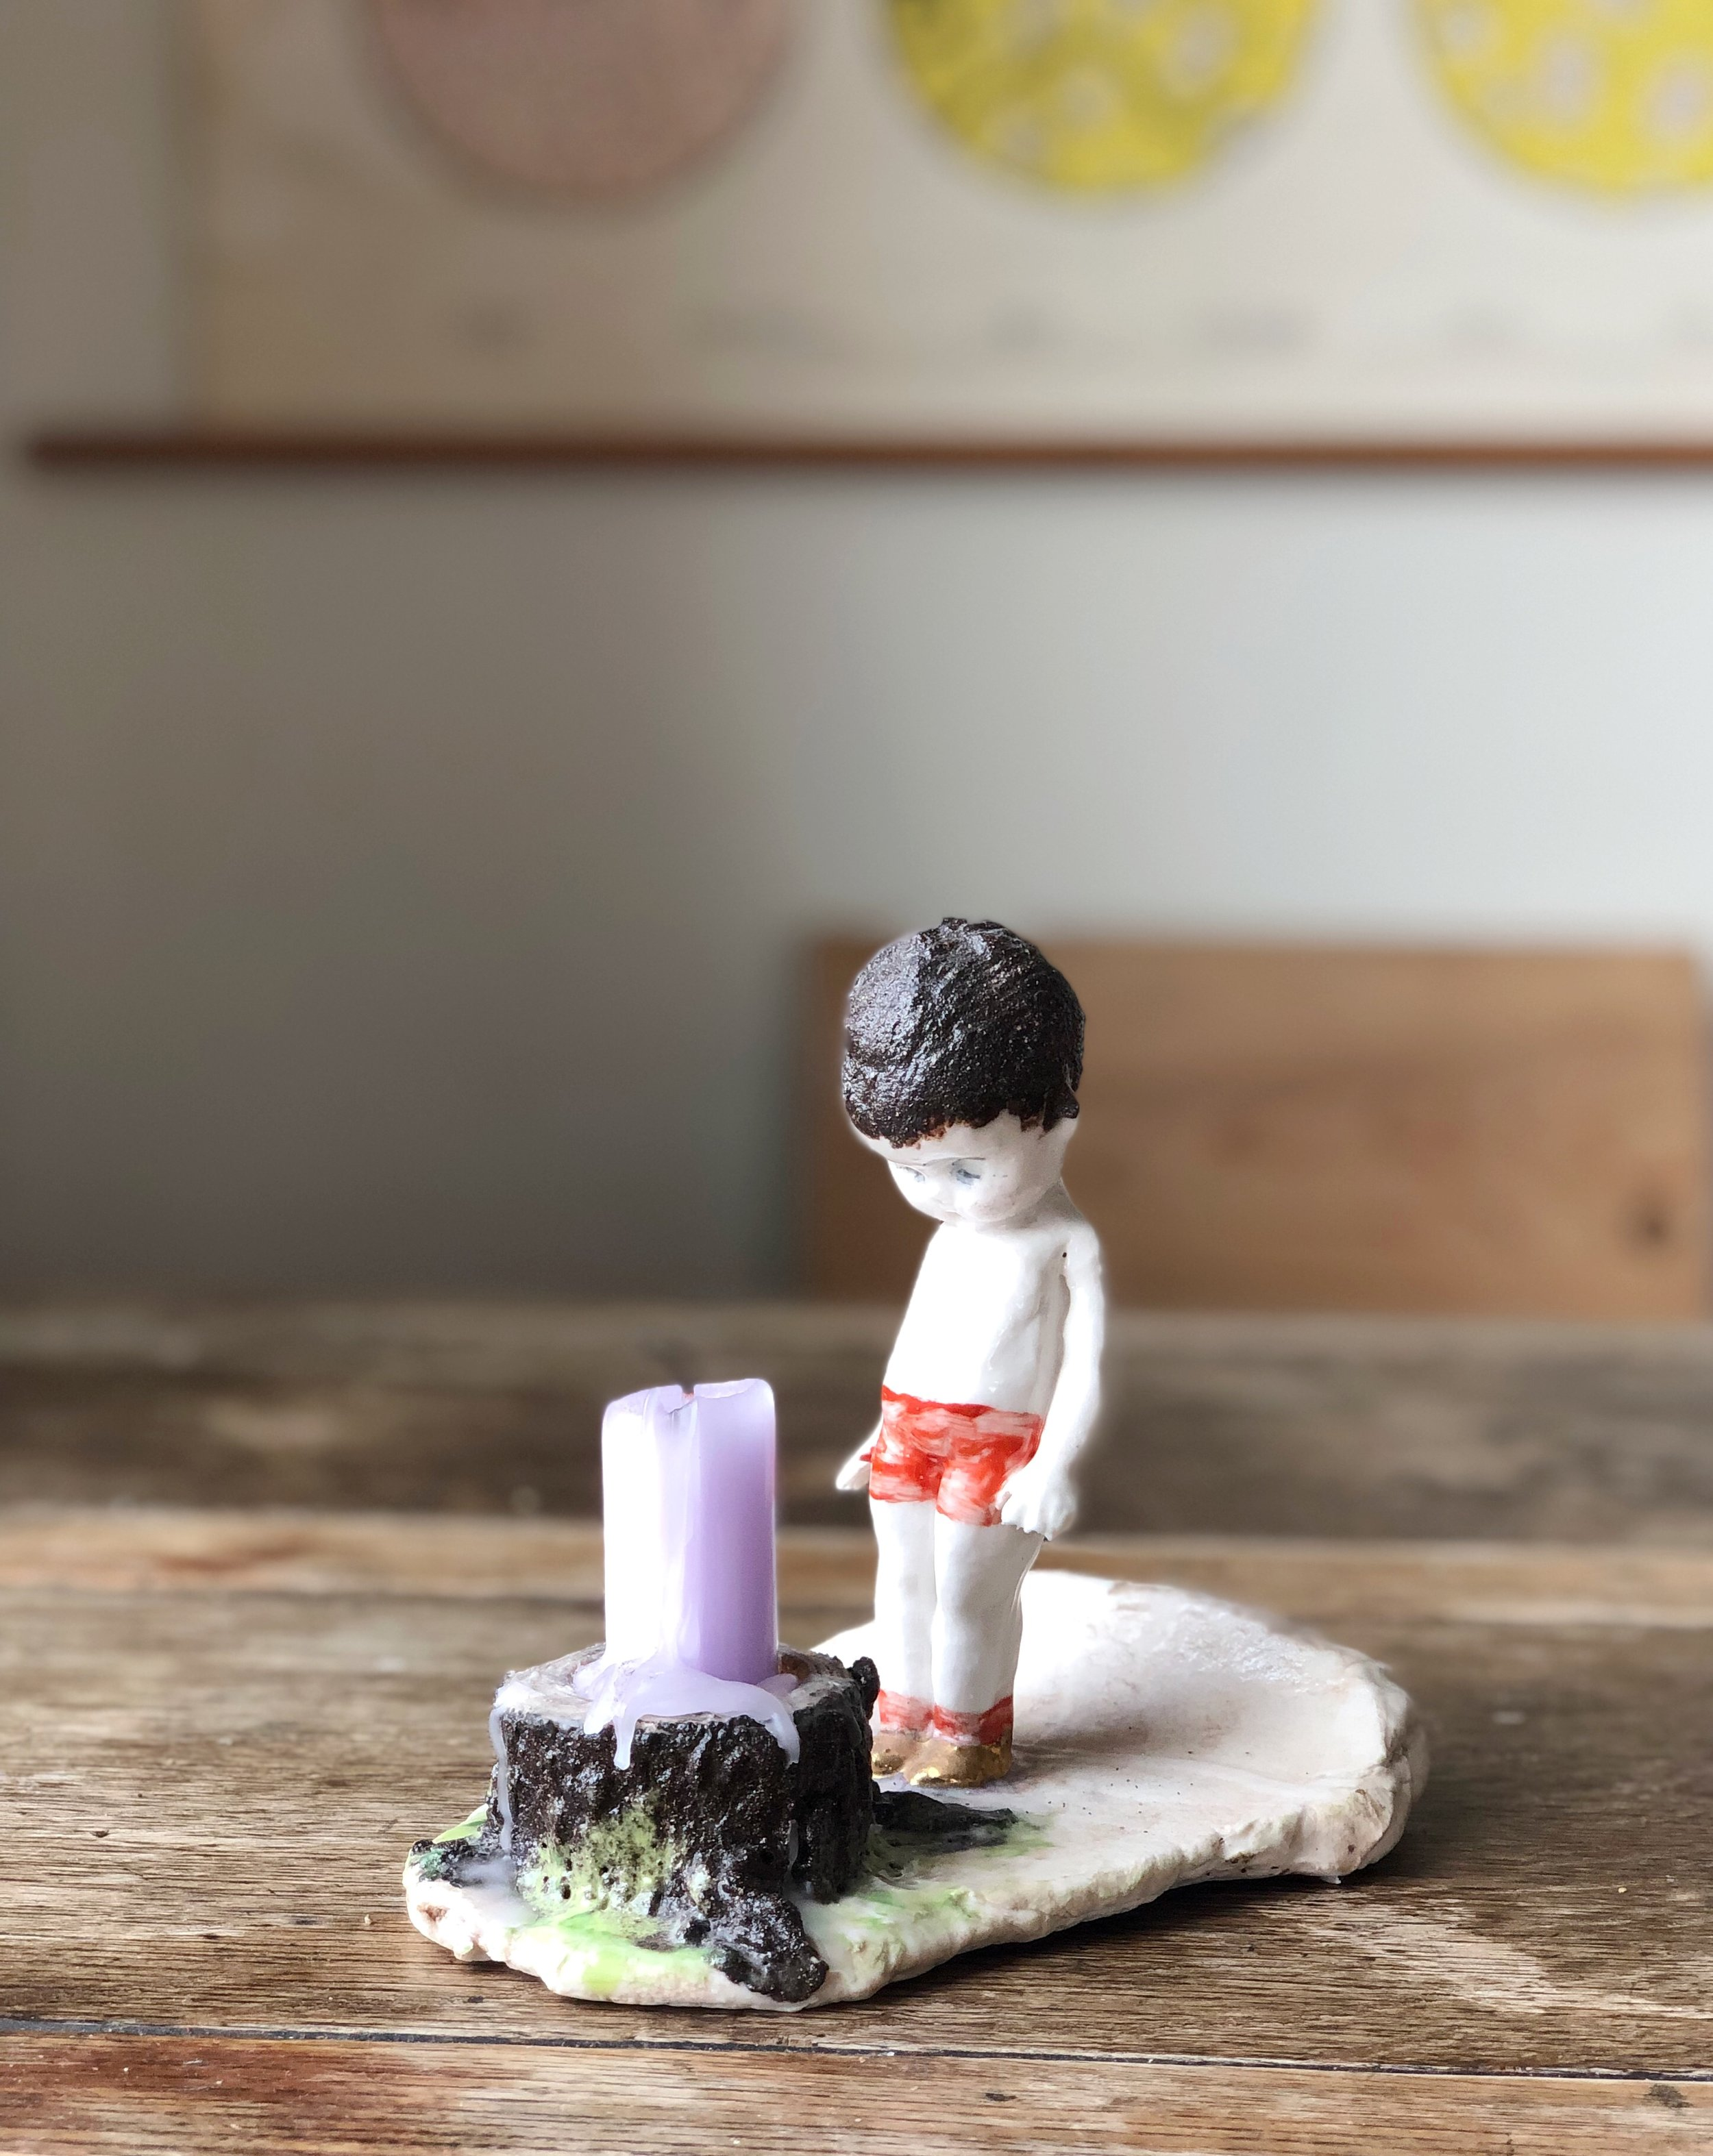 Candlestick holder Boy by Swedish artist Maria Boij